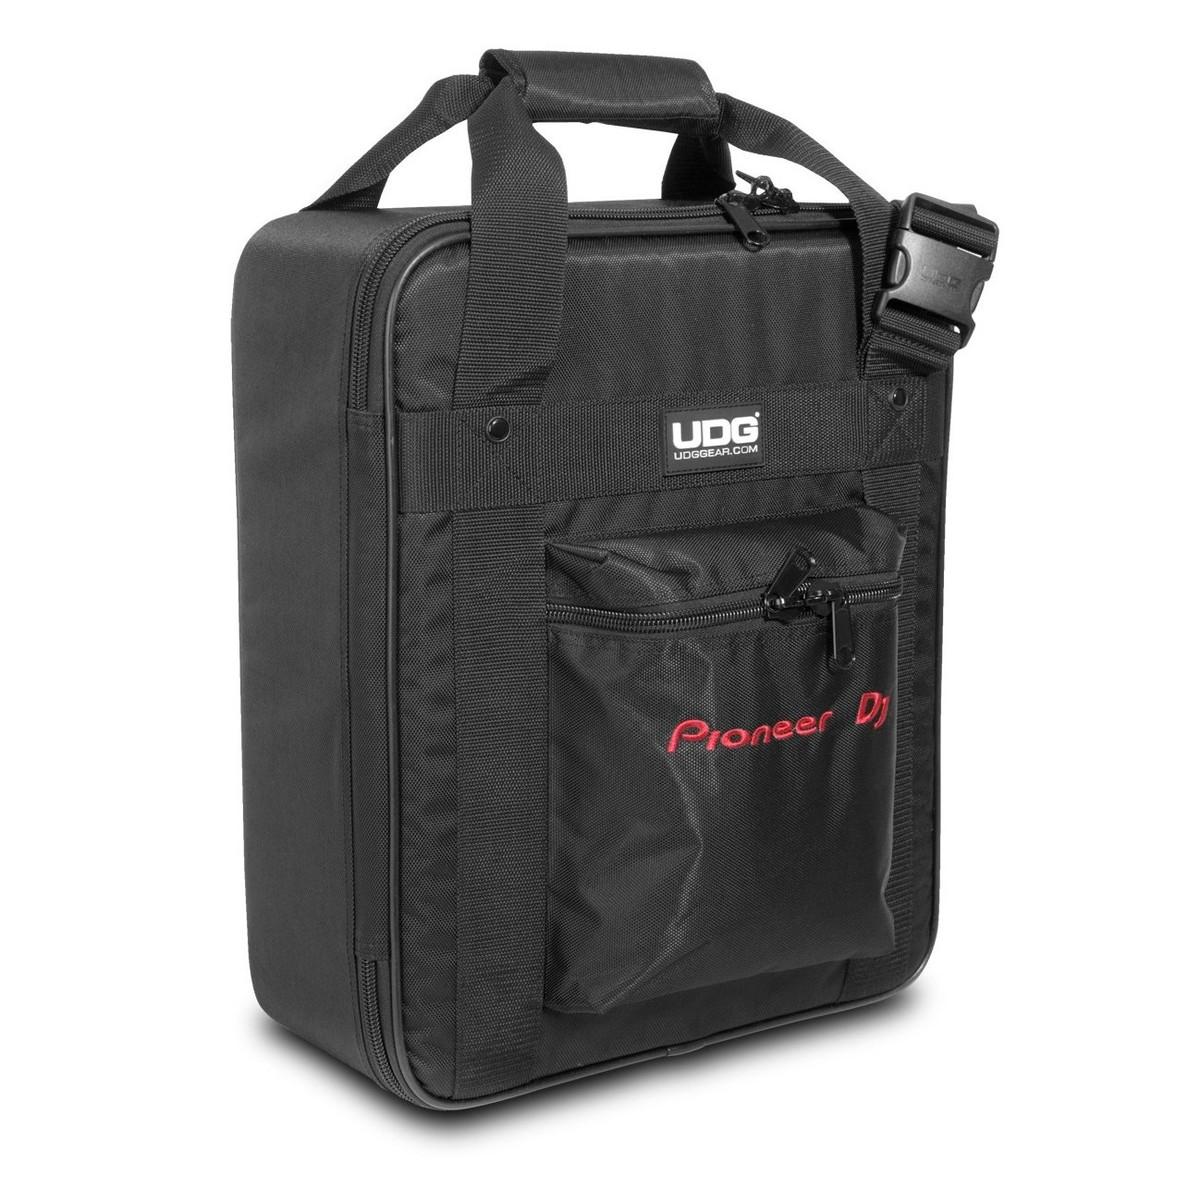 UDG Ultimate Pioneer CD PlayerMixer Bag Large MK2   Gear4music